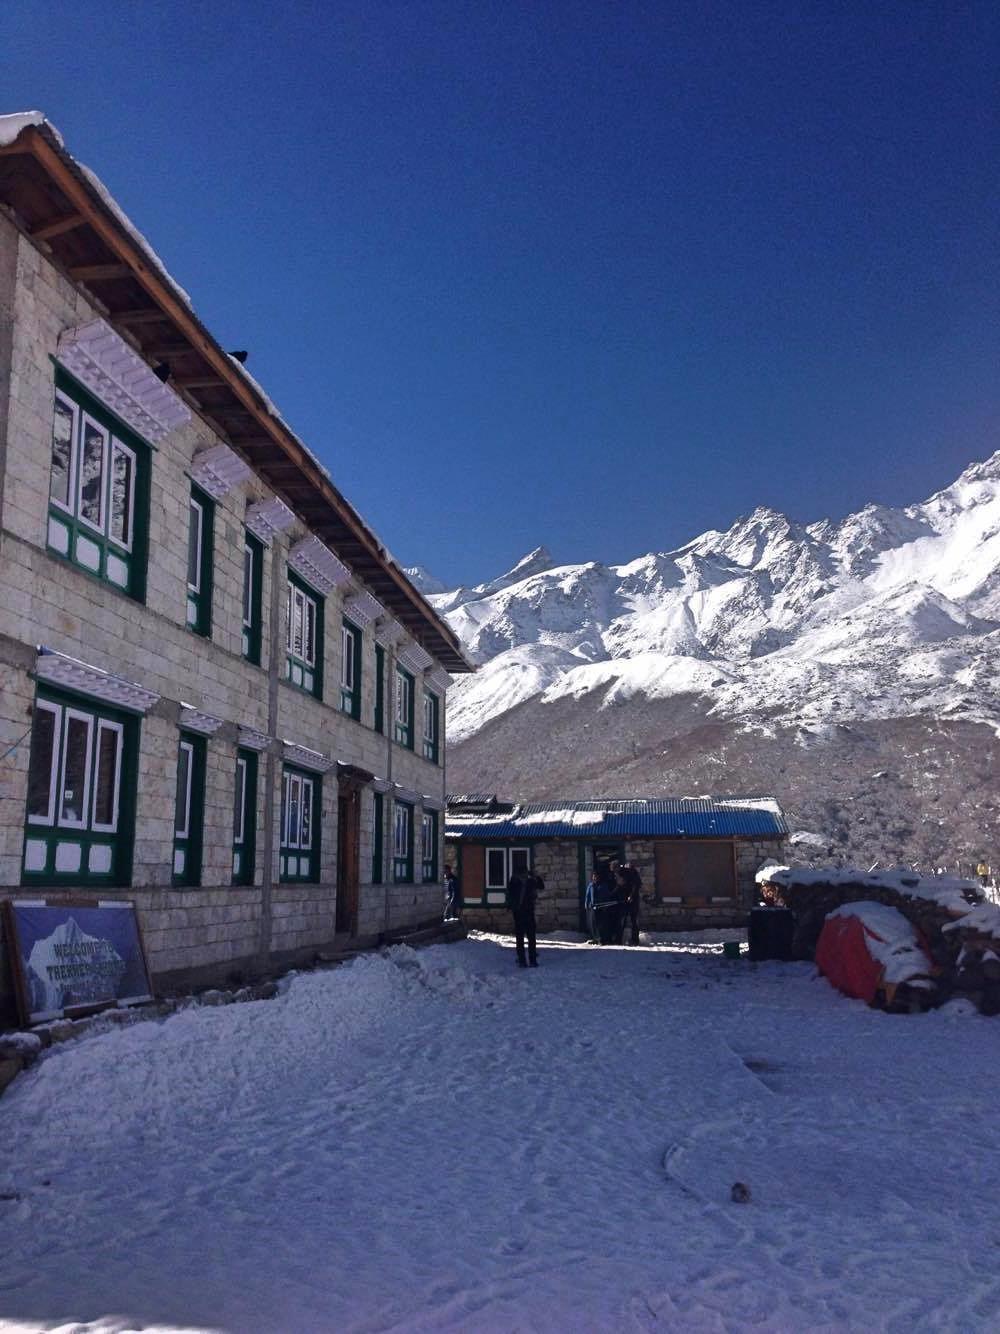 Accommodation Langtang Valley Trek